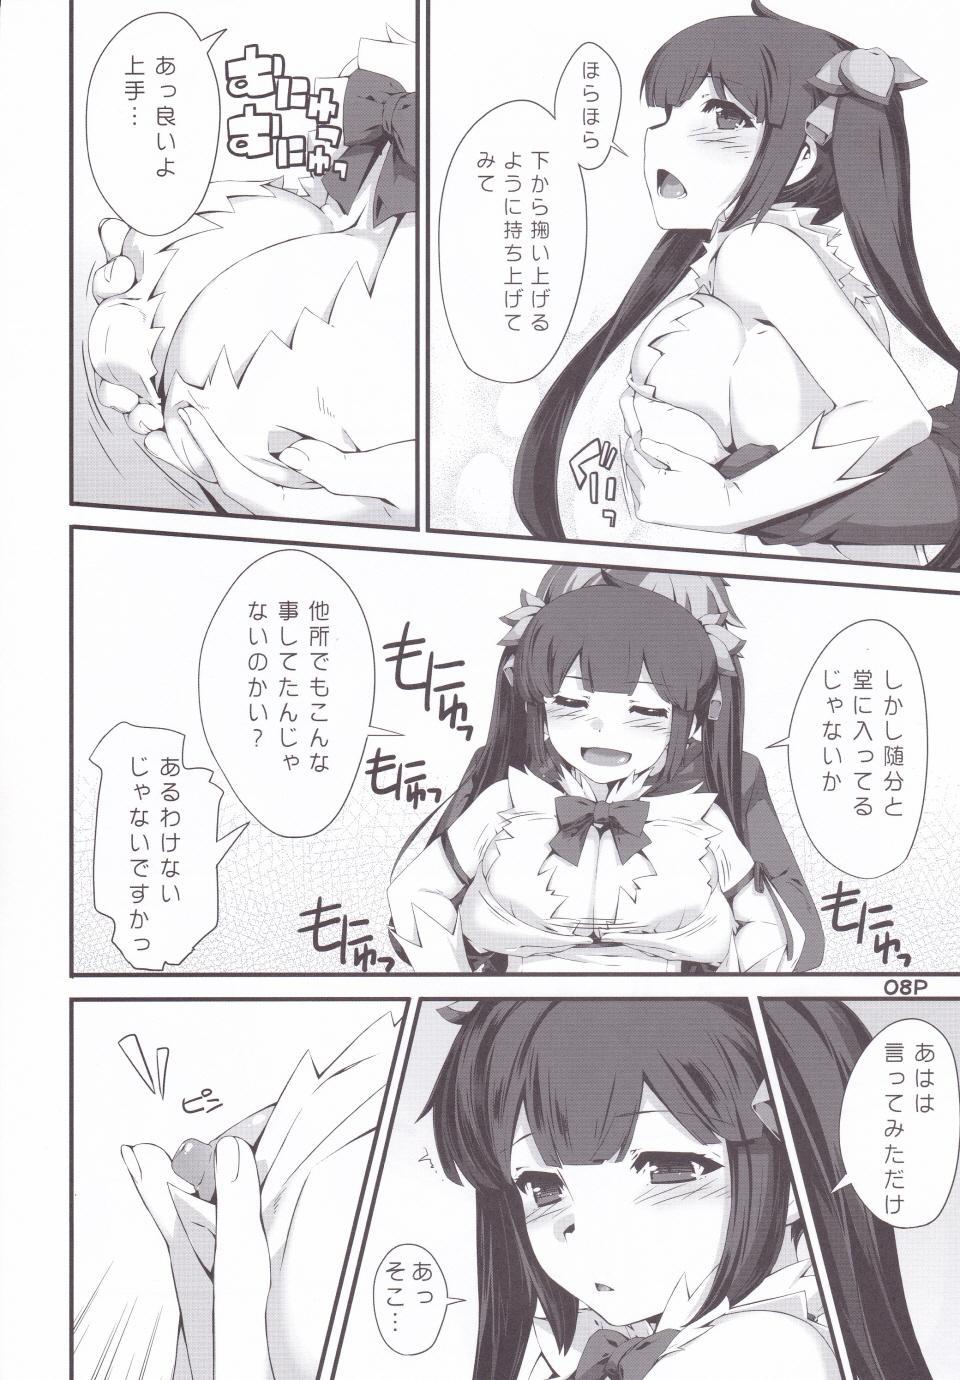 Kamisamano Iu Toori 8